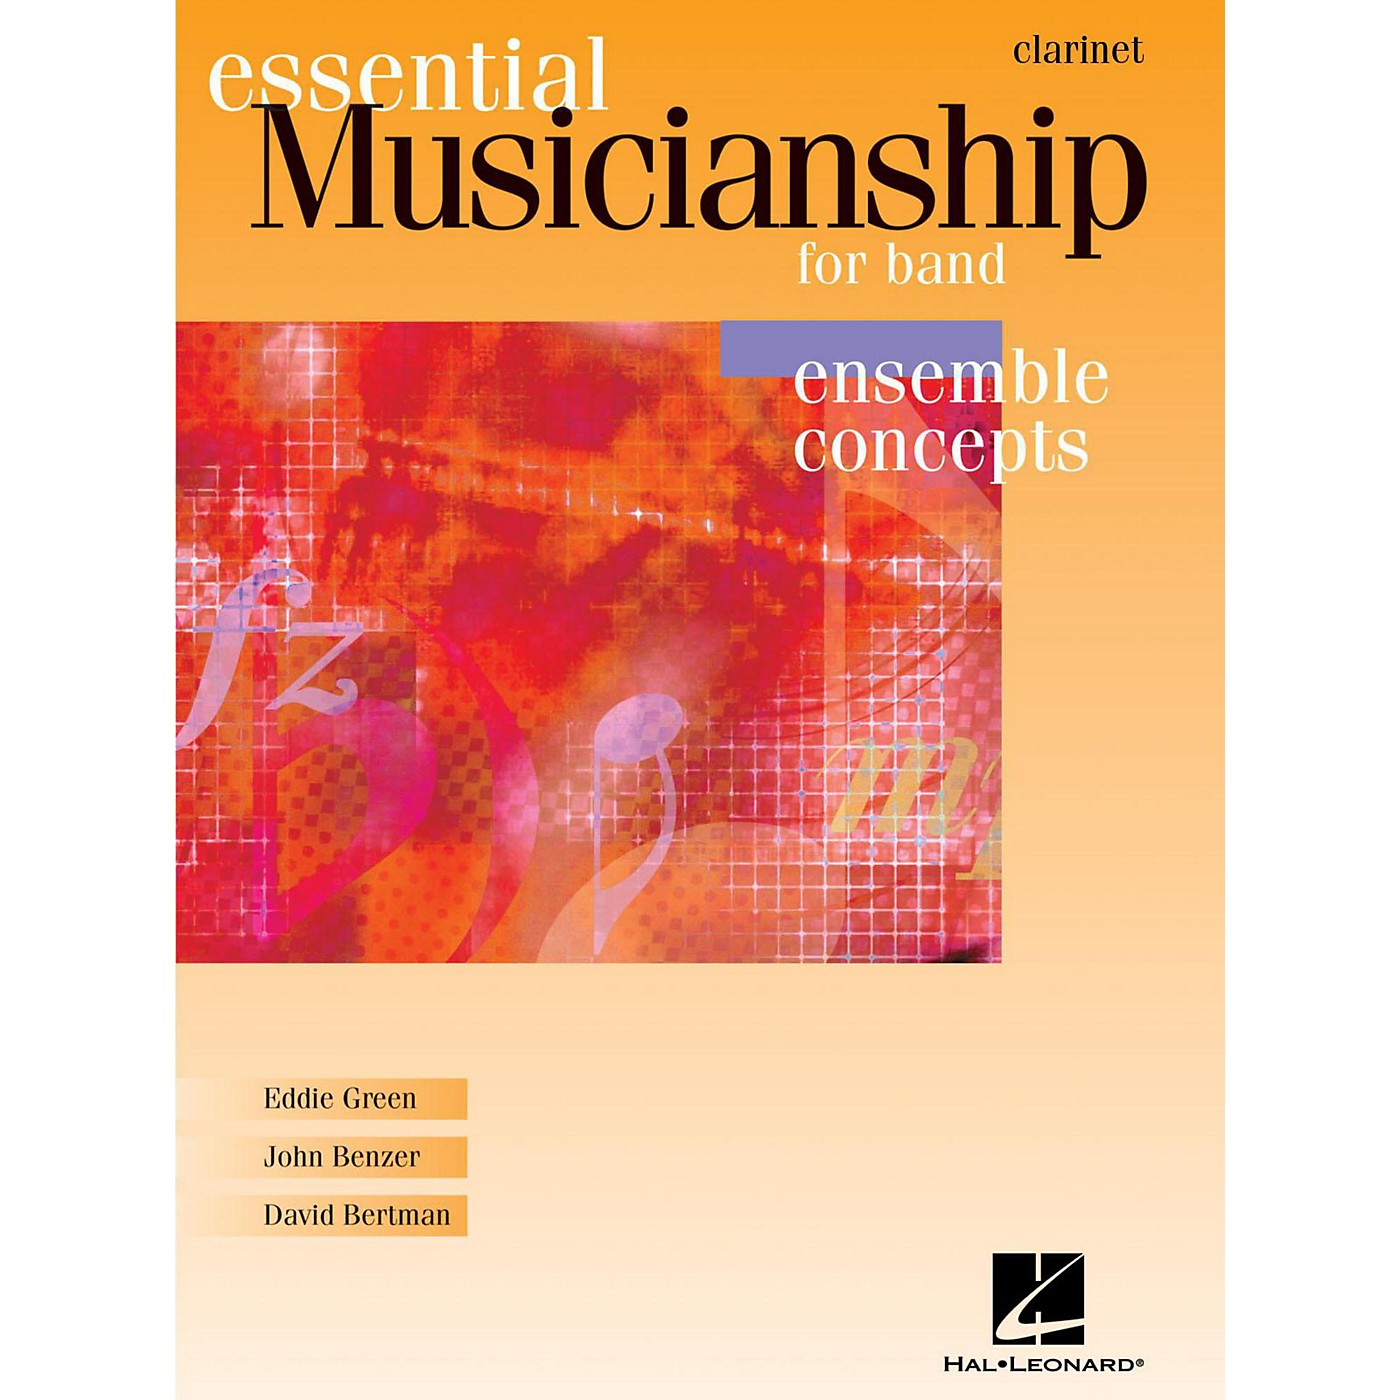 Hal Leonard Essential Musicianship for Band - Ensemble Concepts Clarinet thumbnail